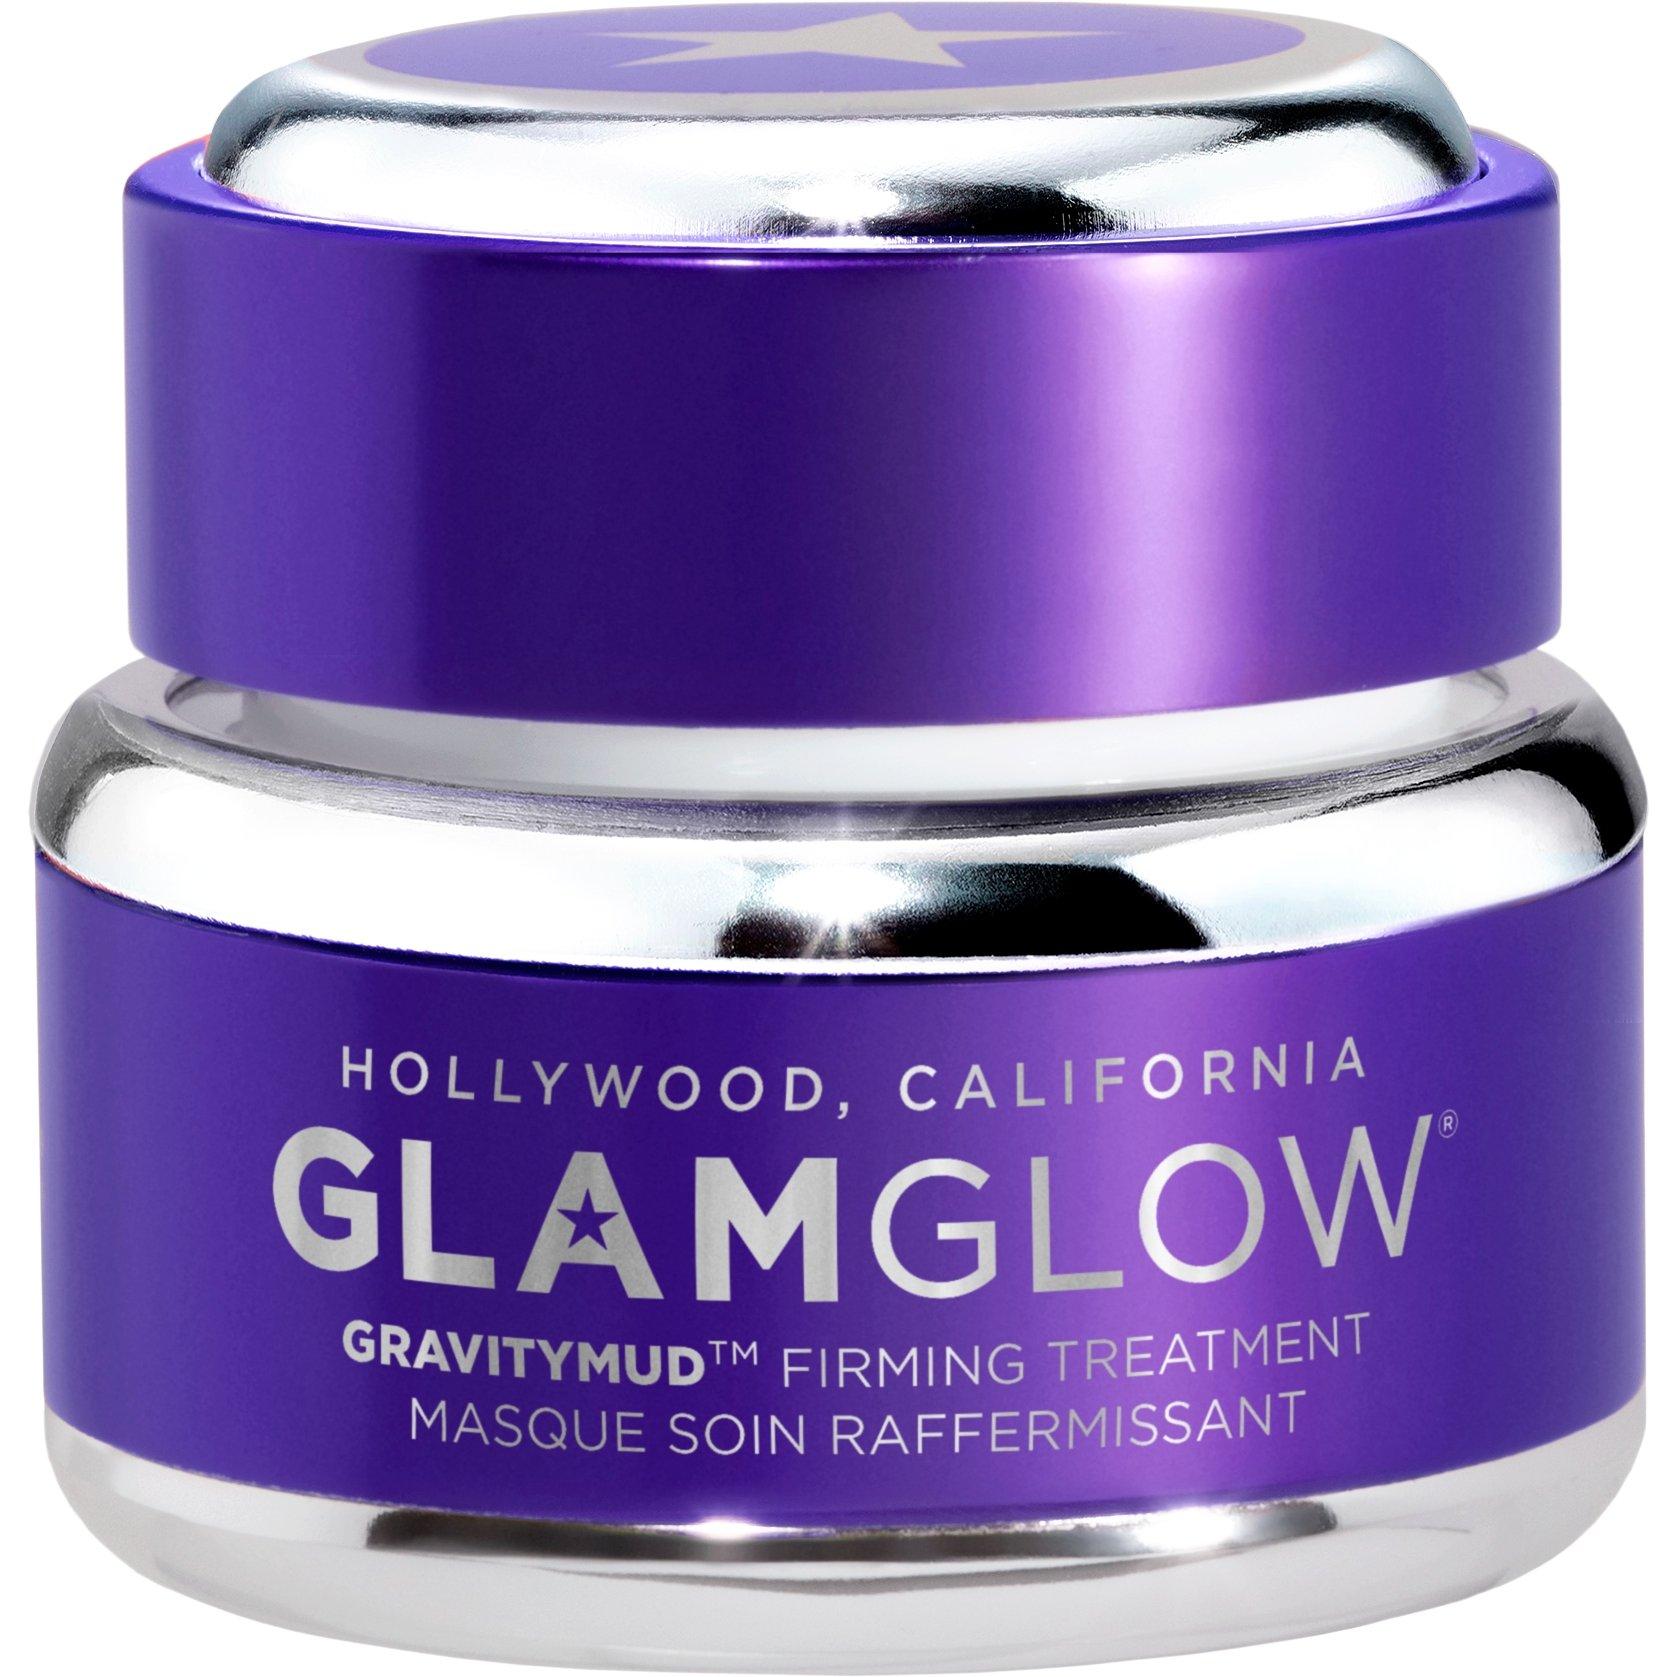 Glamglow Mask Gravitymud Firming Treatment Mask Μάσκα Προσώπου για Τόνωση της Επιδερμίδας 15gr